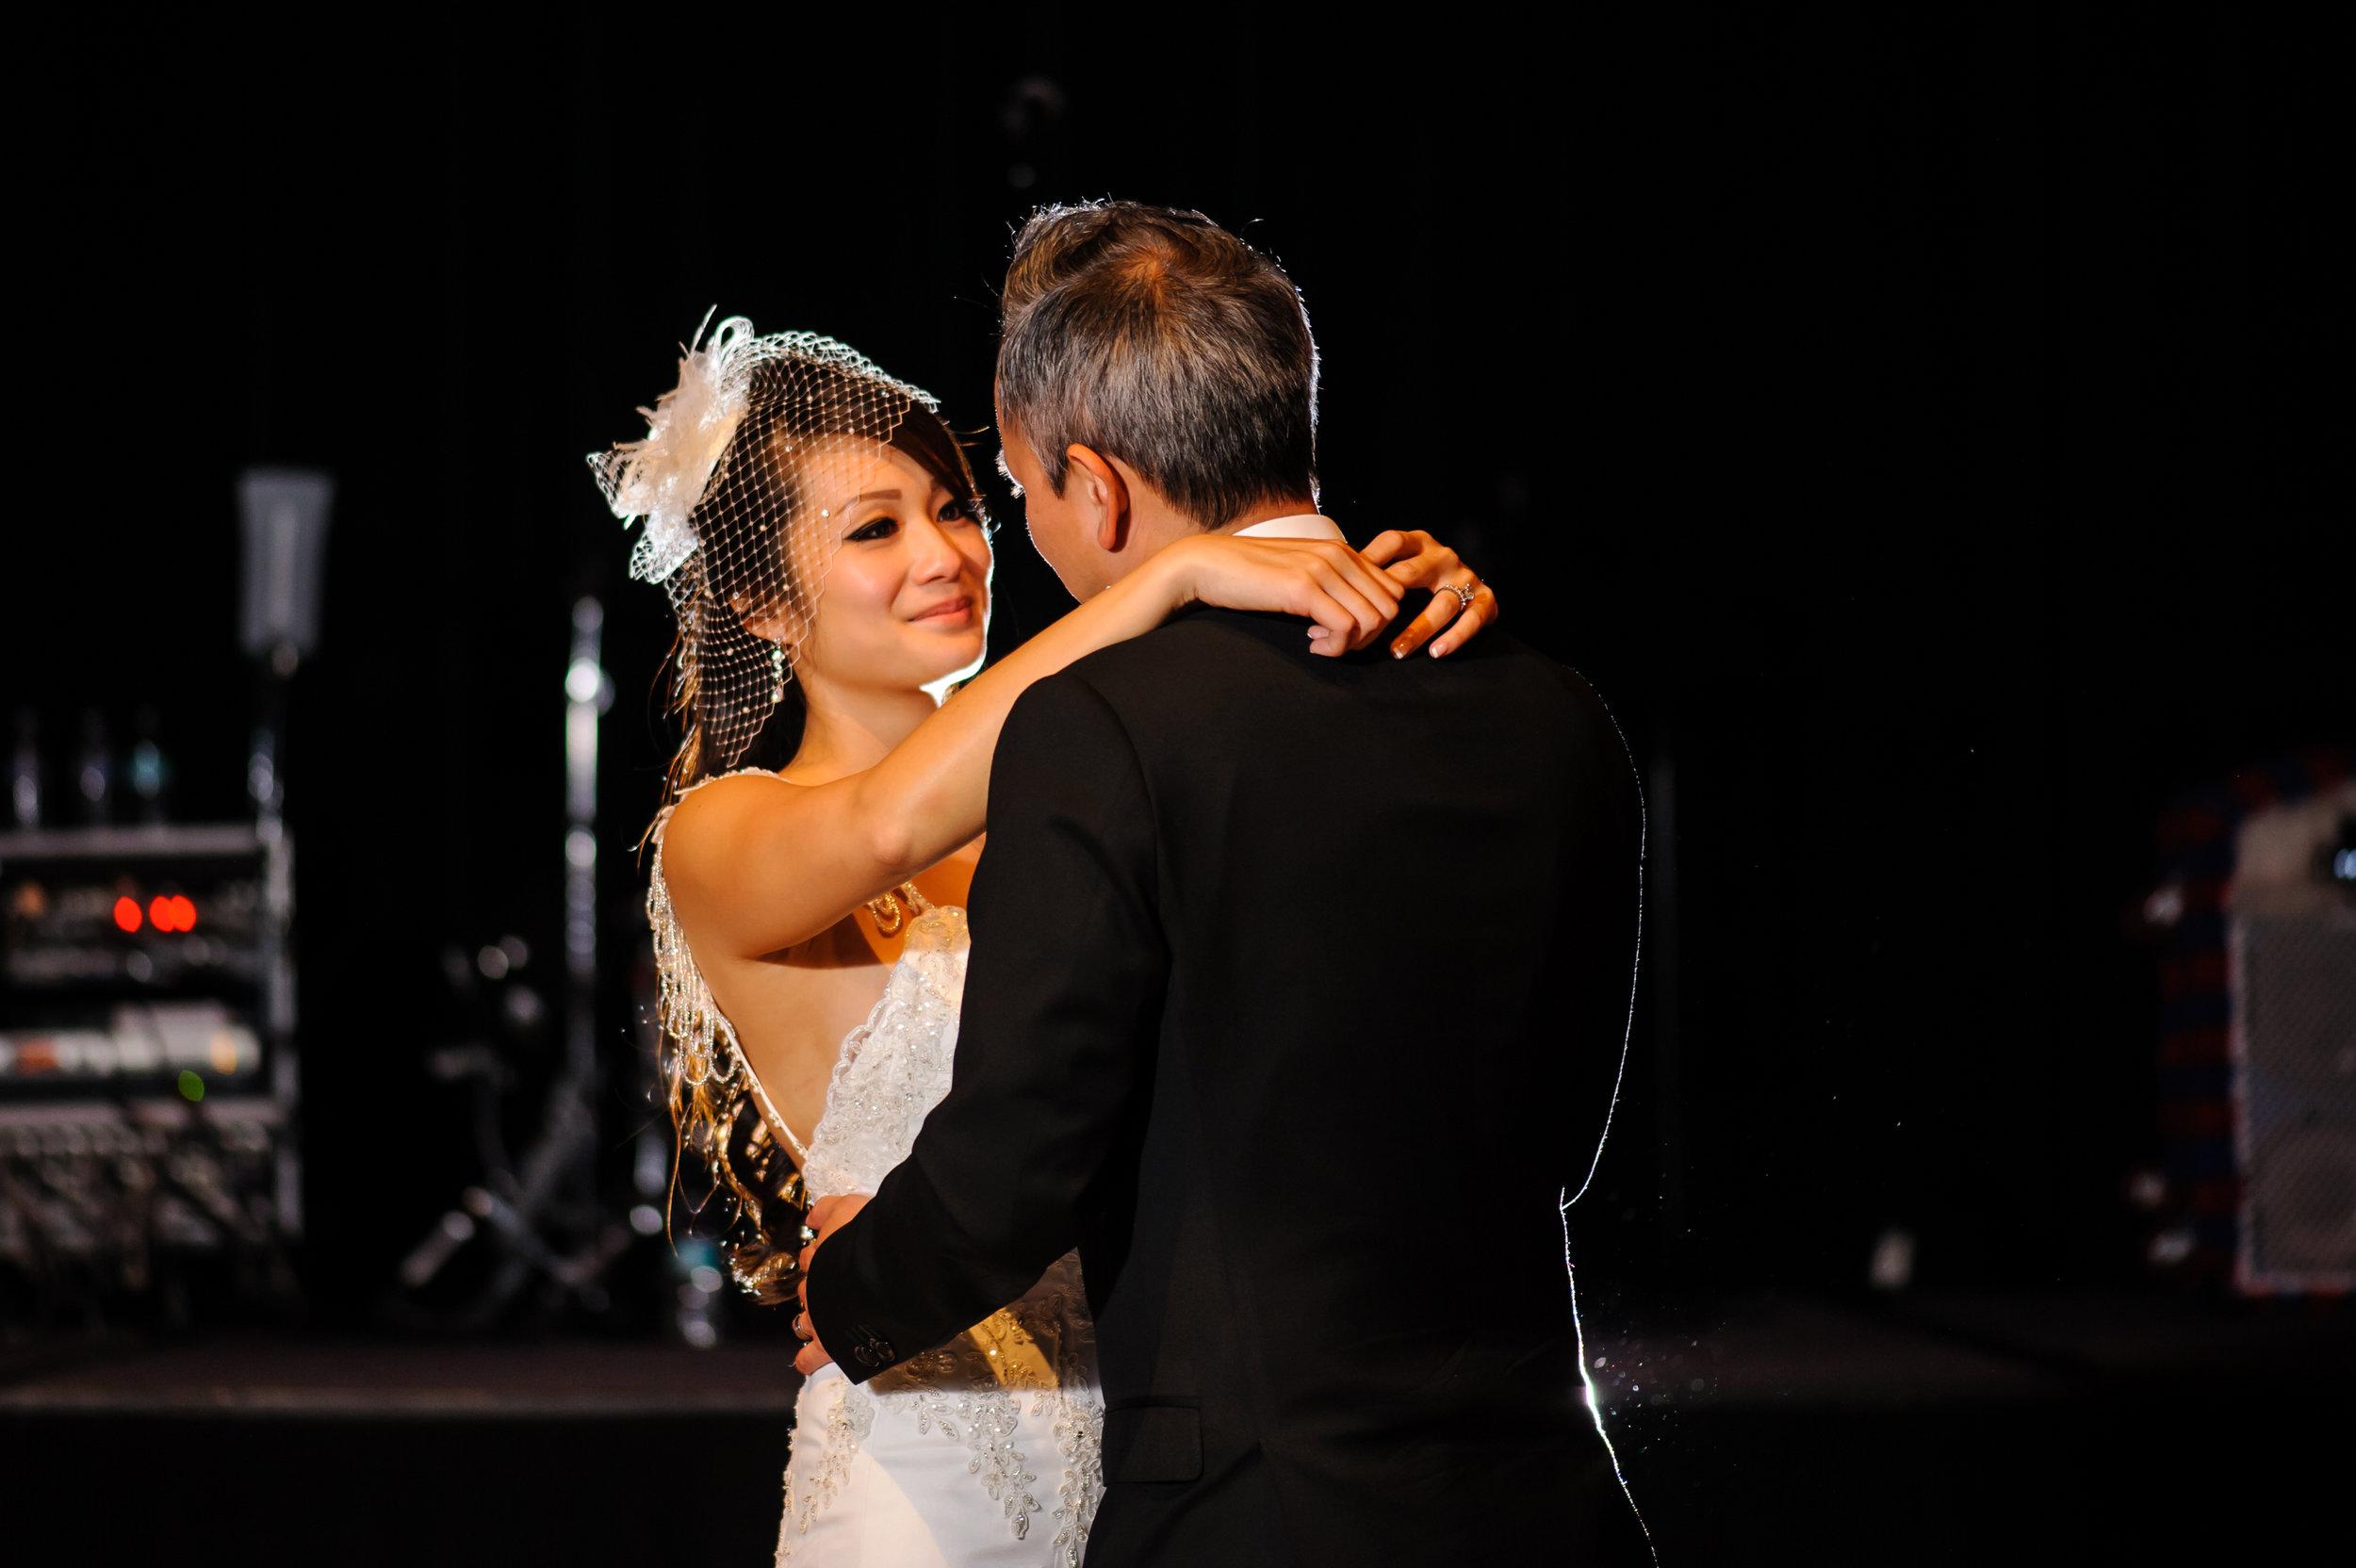 camilla-thuy-071-memorial-auditorium-sacramento-wedding-photographer-katherine-nicole-photography.JPG